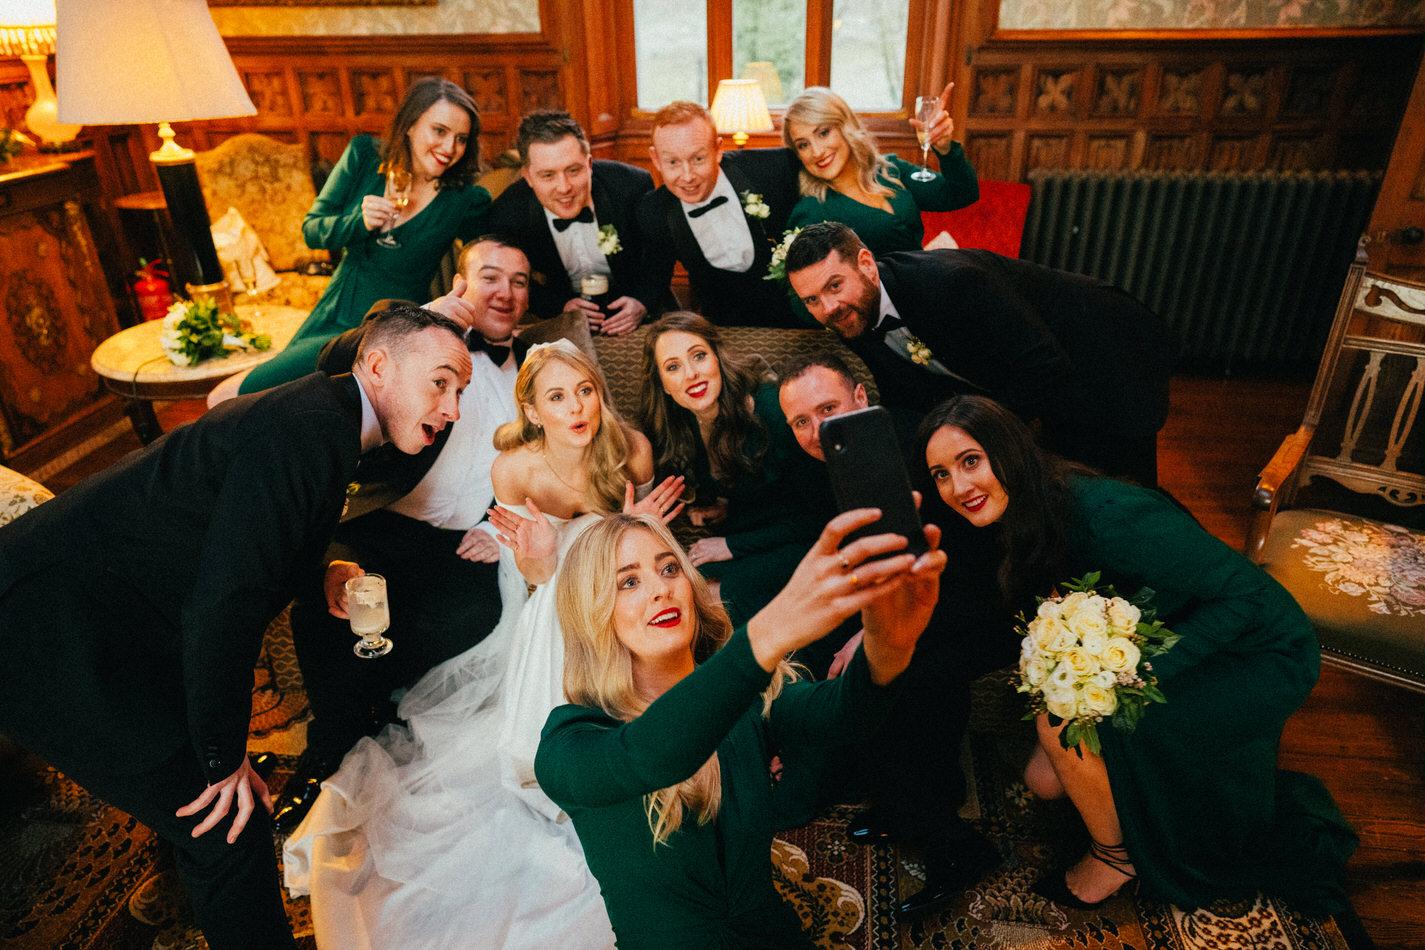 Castle-wedding-ireland-photos- 0248 186